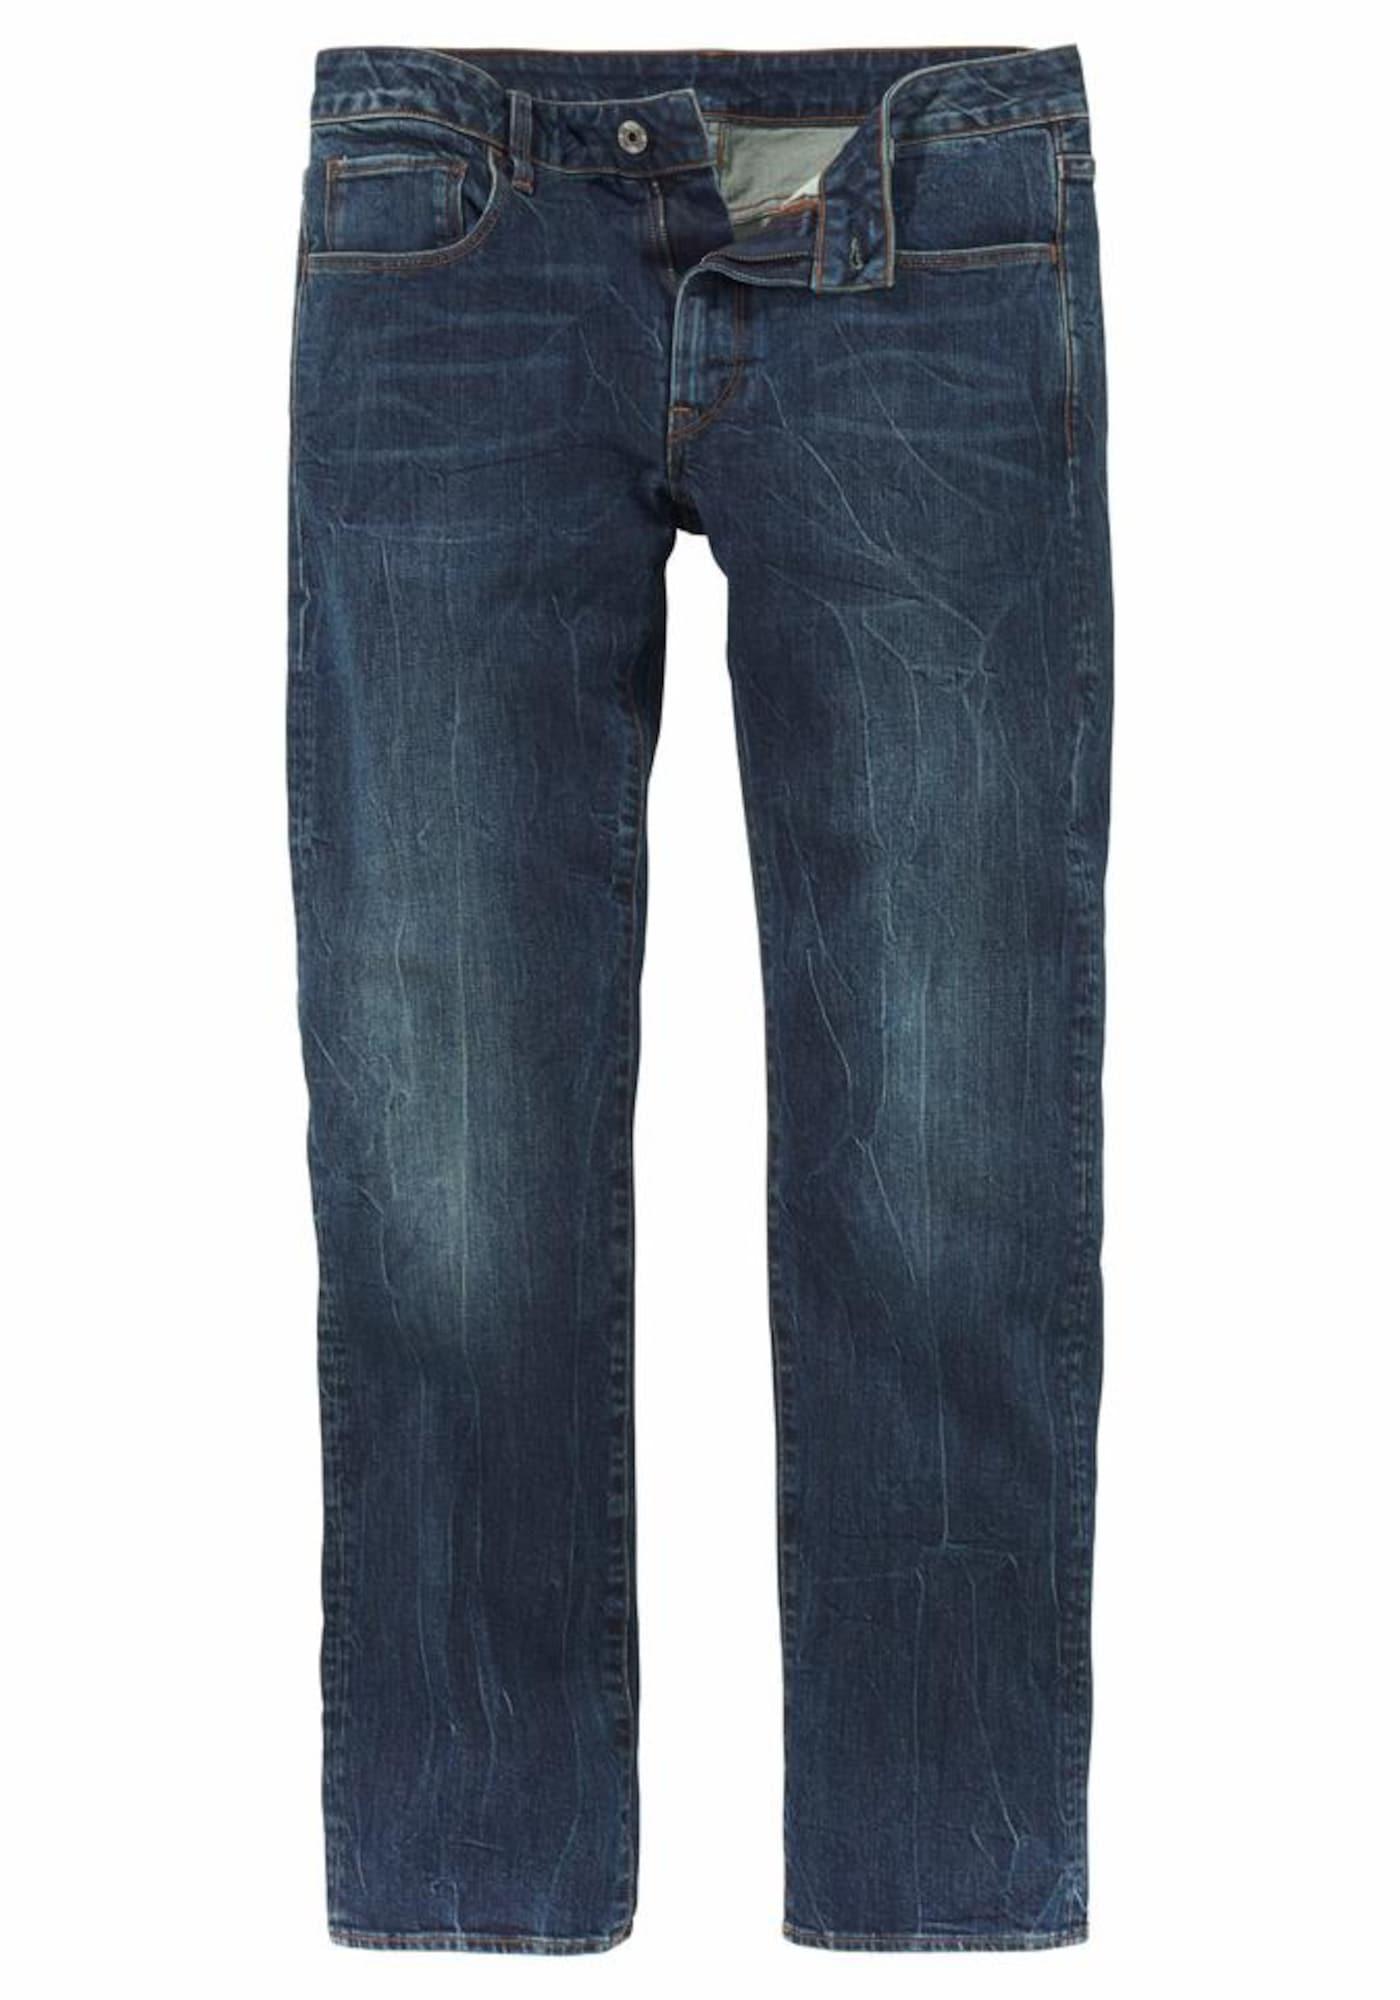 G-STAR RAW Heren Jeans blue denim